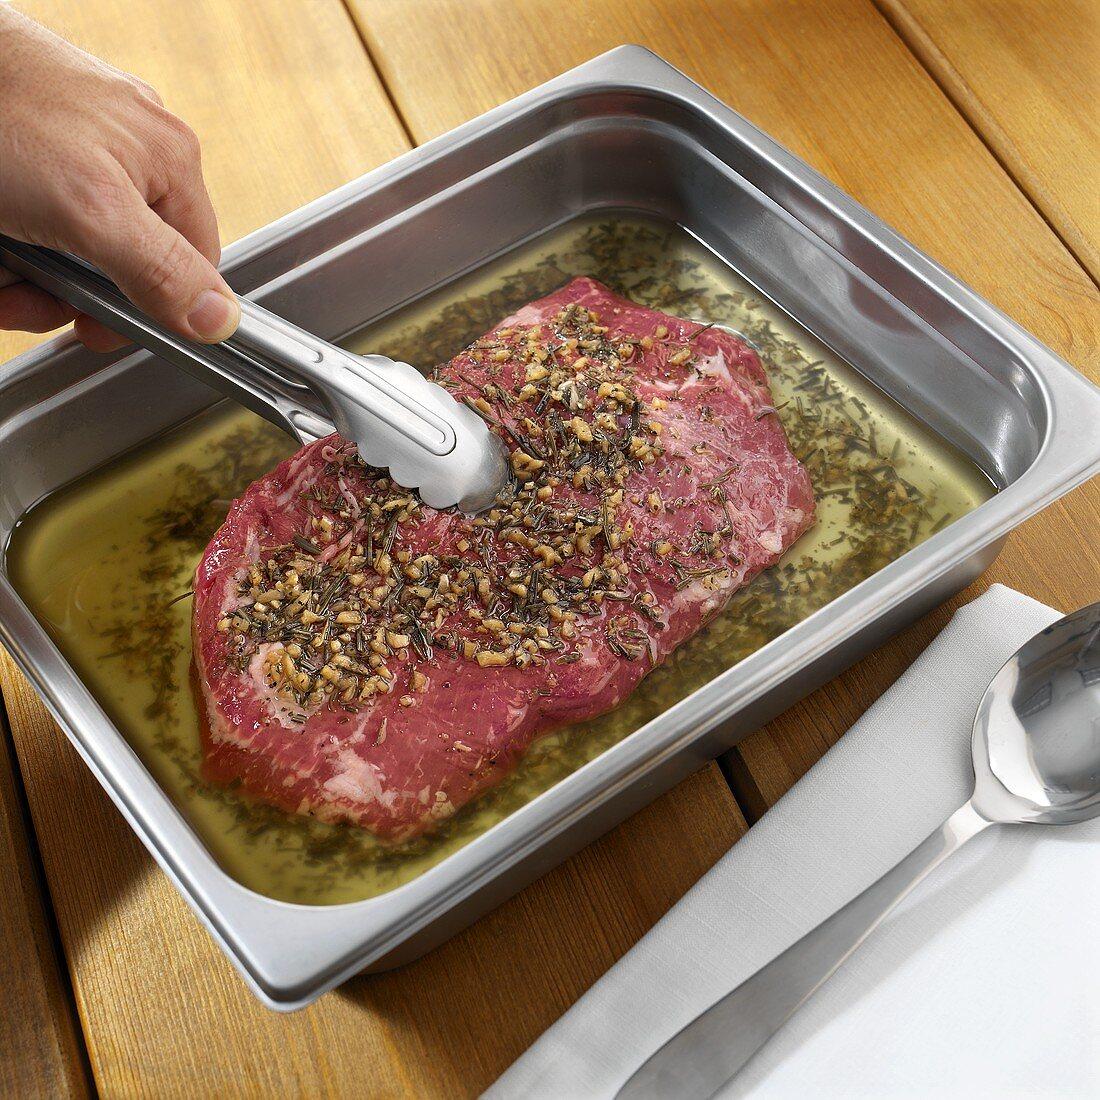 Turning steak in herb marinade